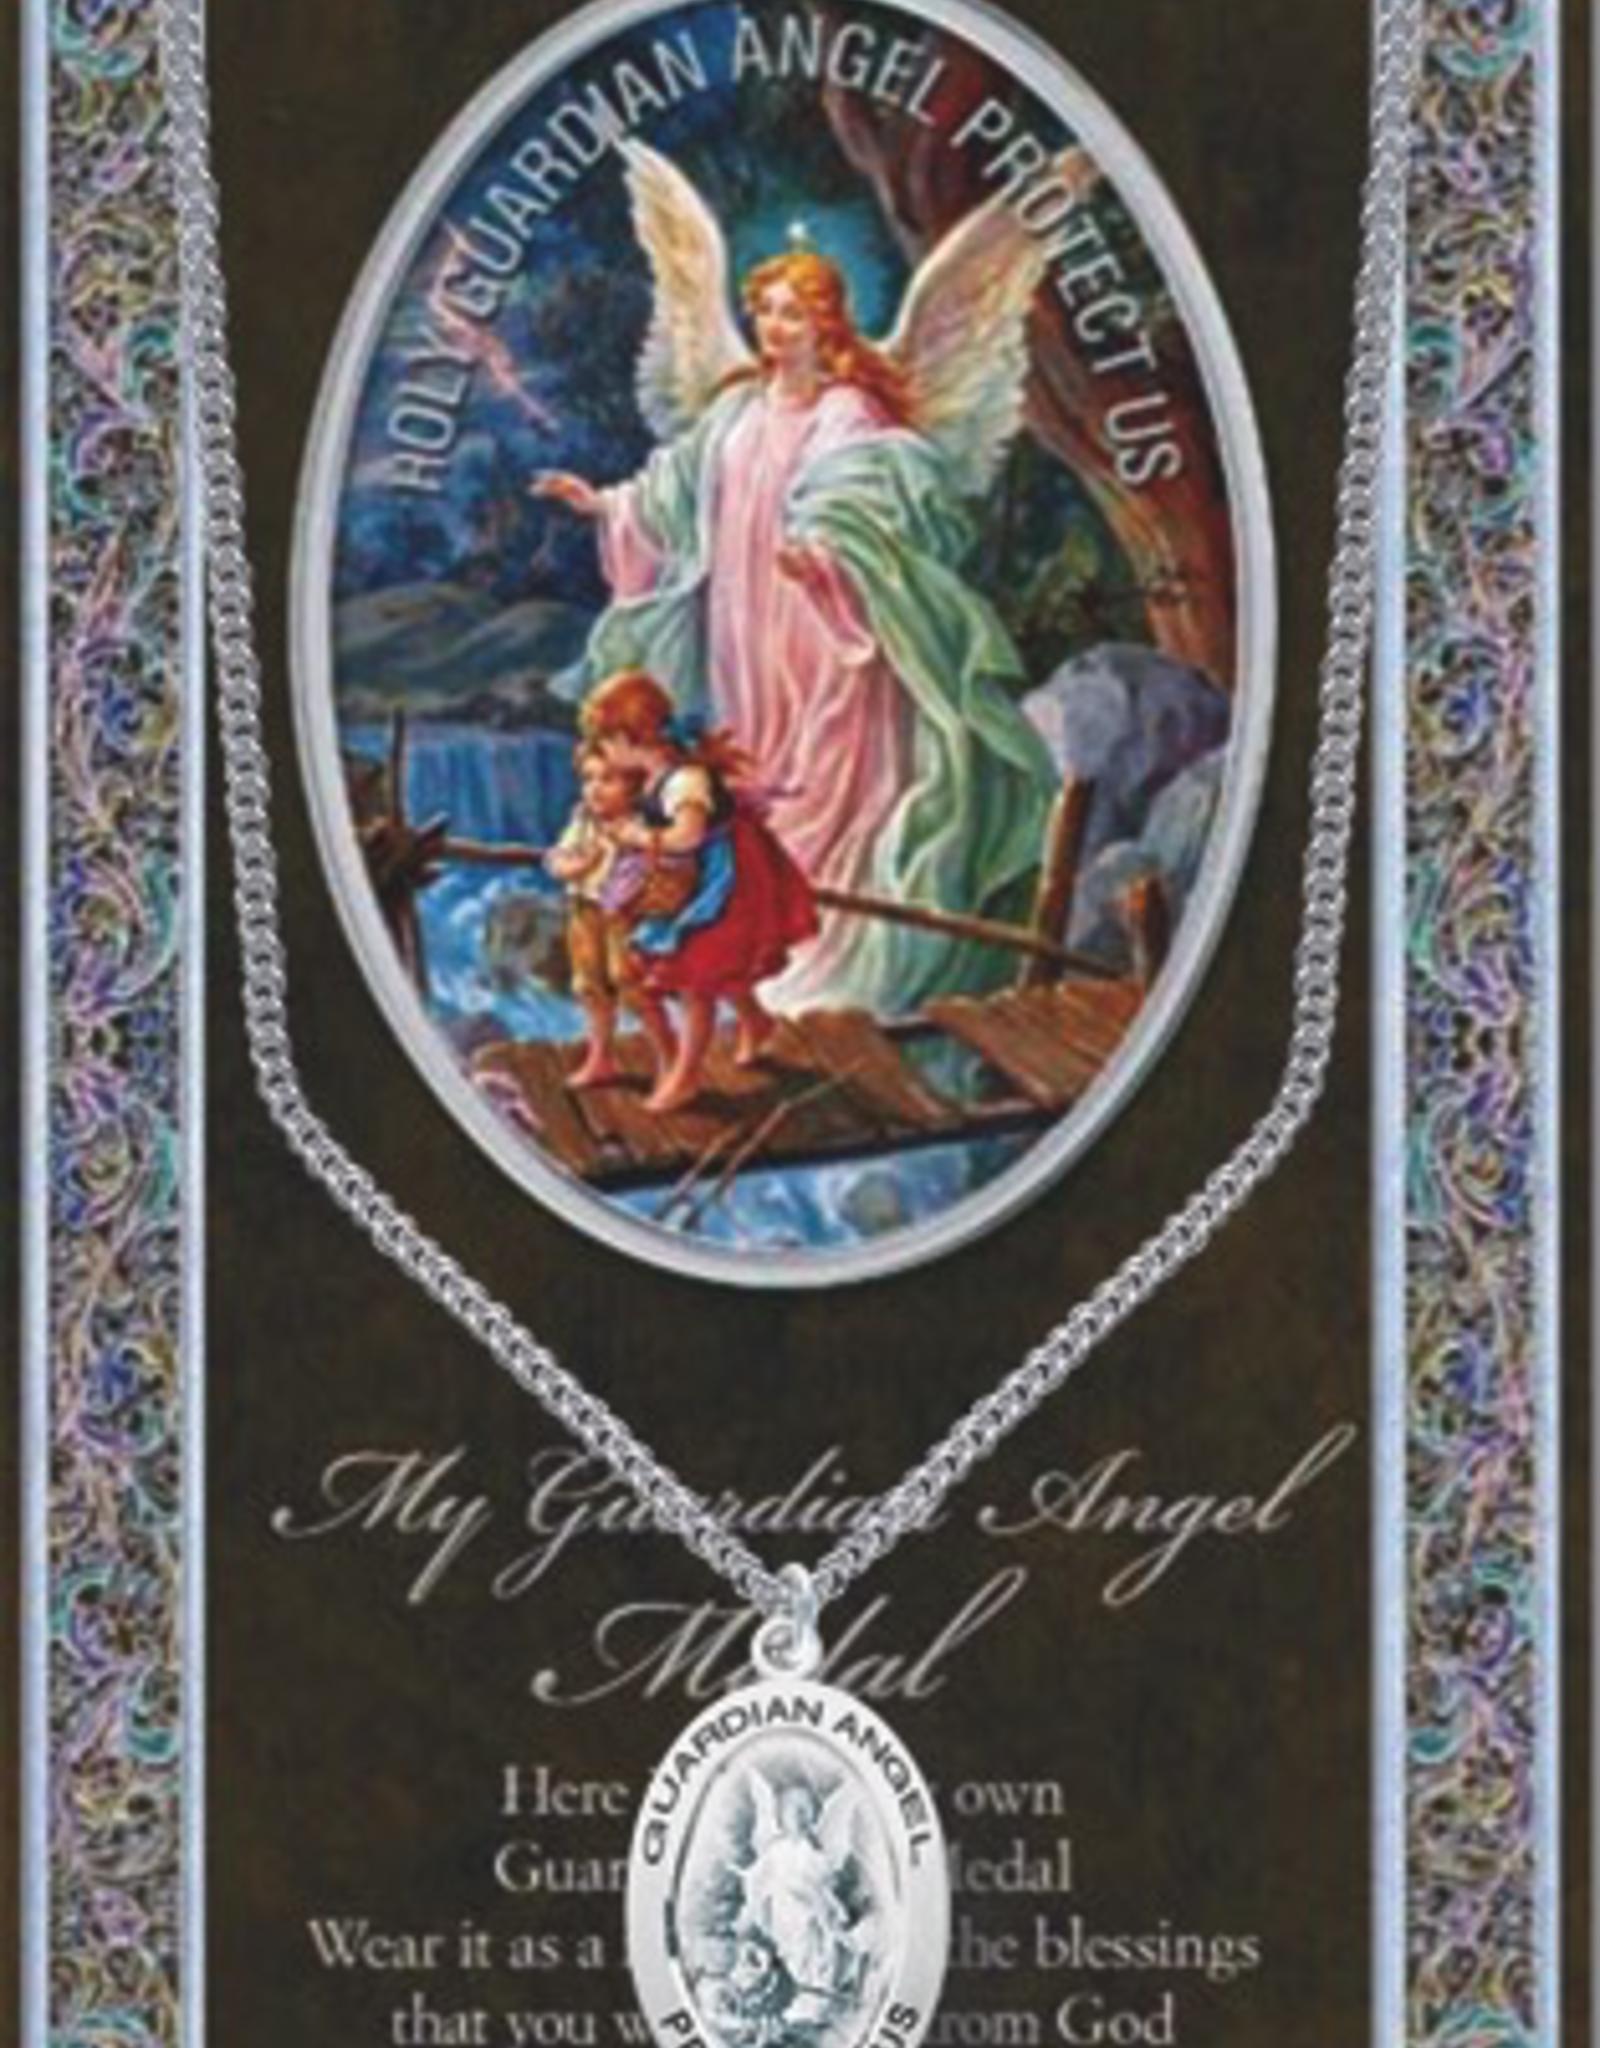 WJ Hirten Guardian Angel Medal Necklace w/ Prayer Card (20‰Û Stainless Steel Chain)